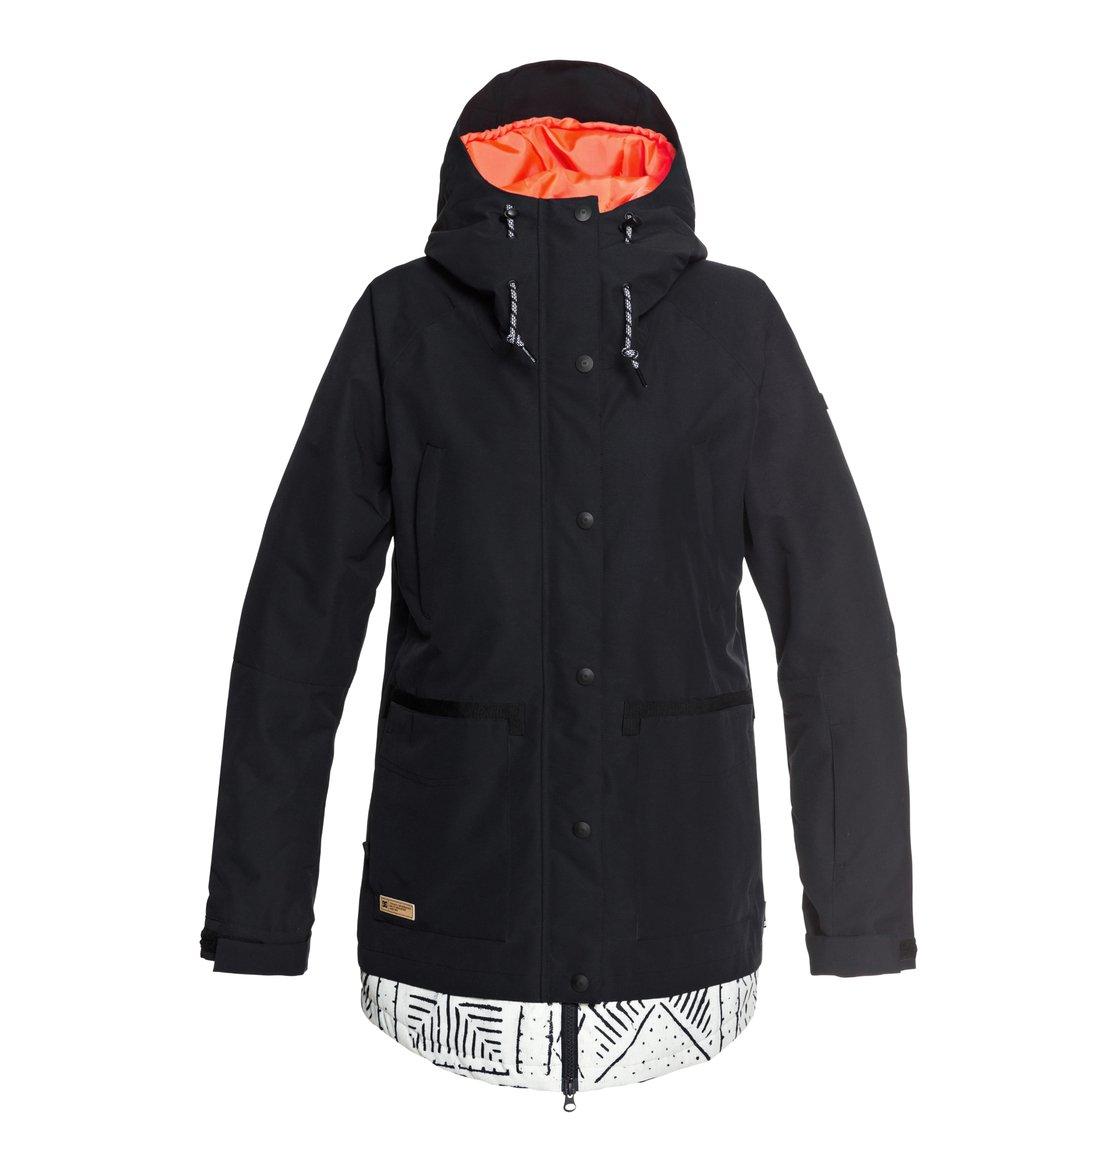 Riji Parka Snow Jacket For Women 3613373677587 Dc Shoes